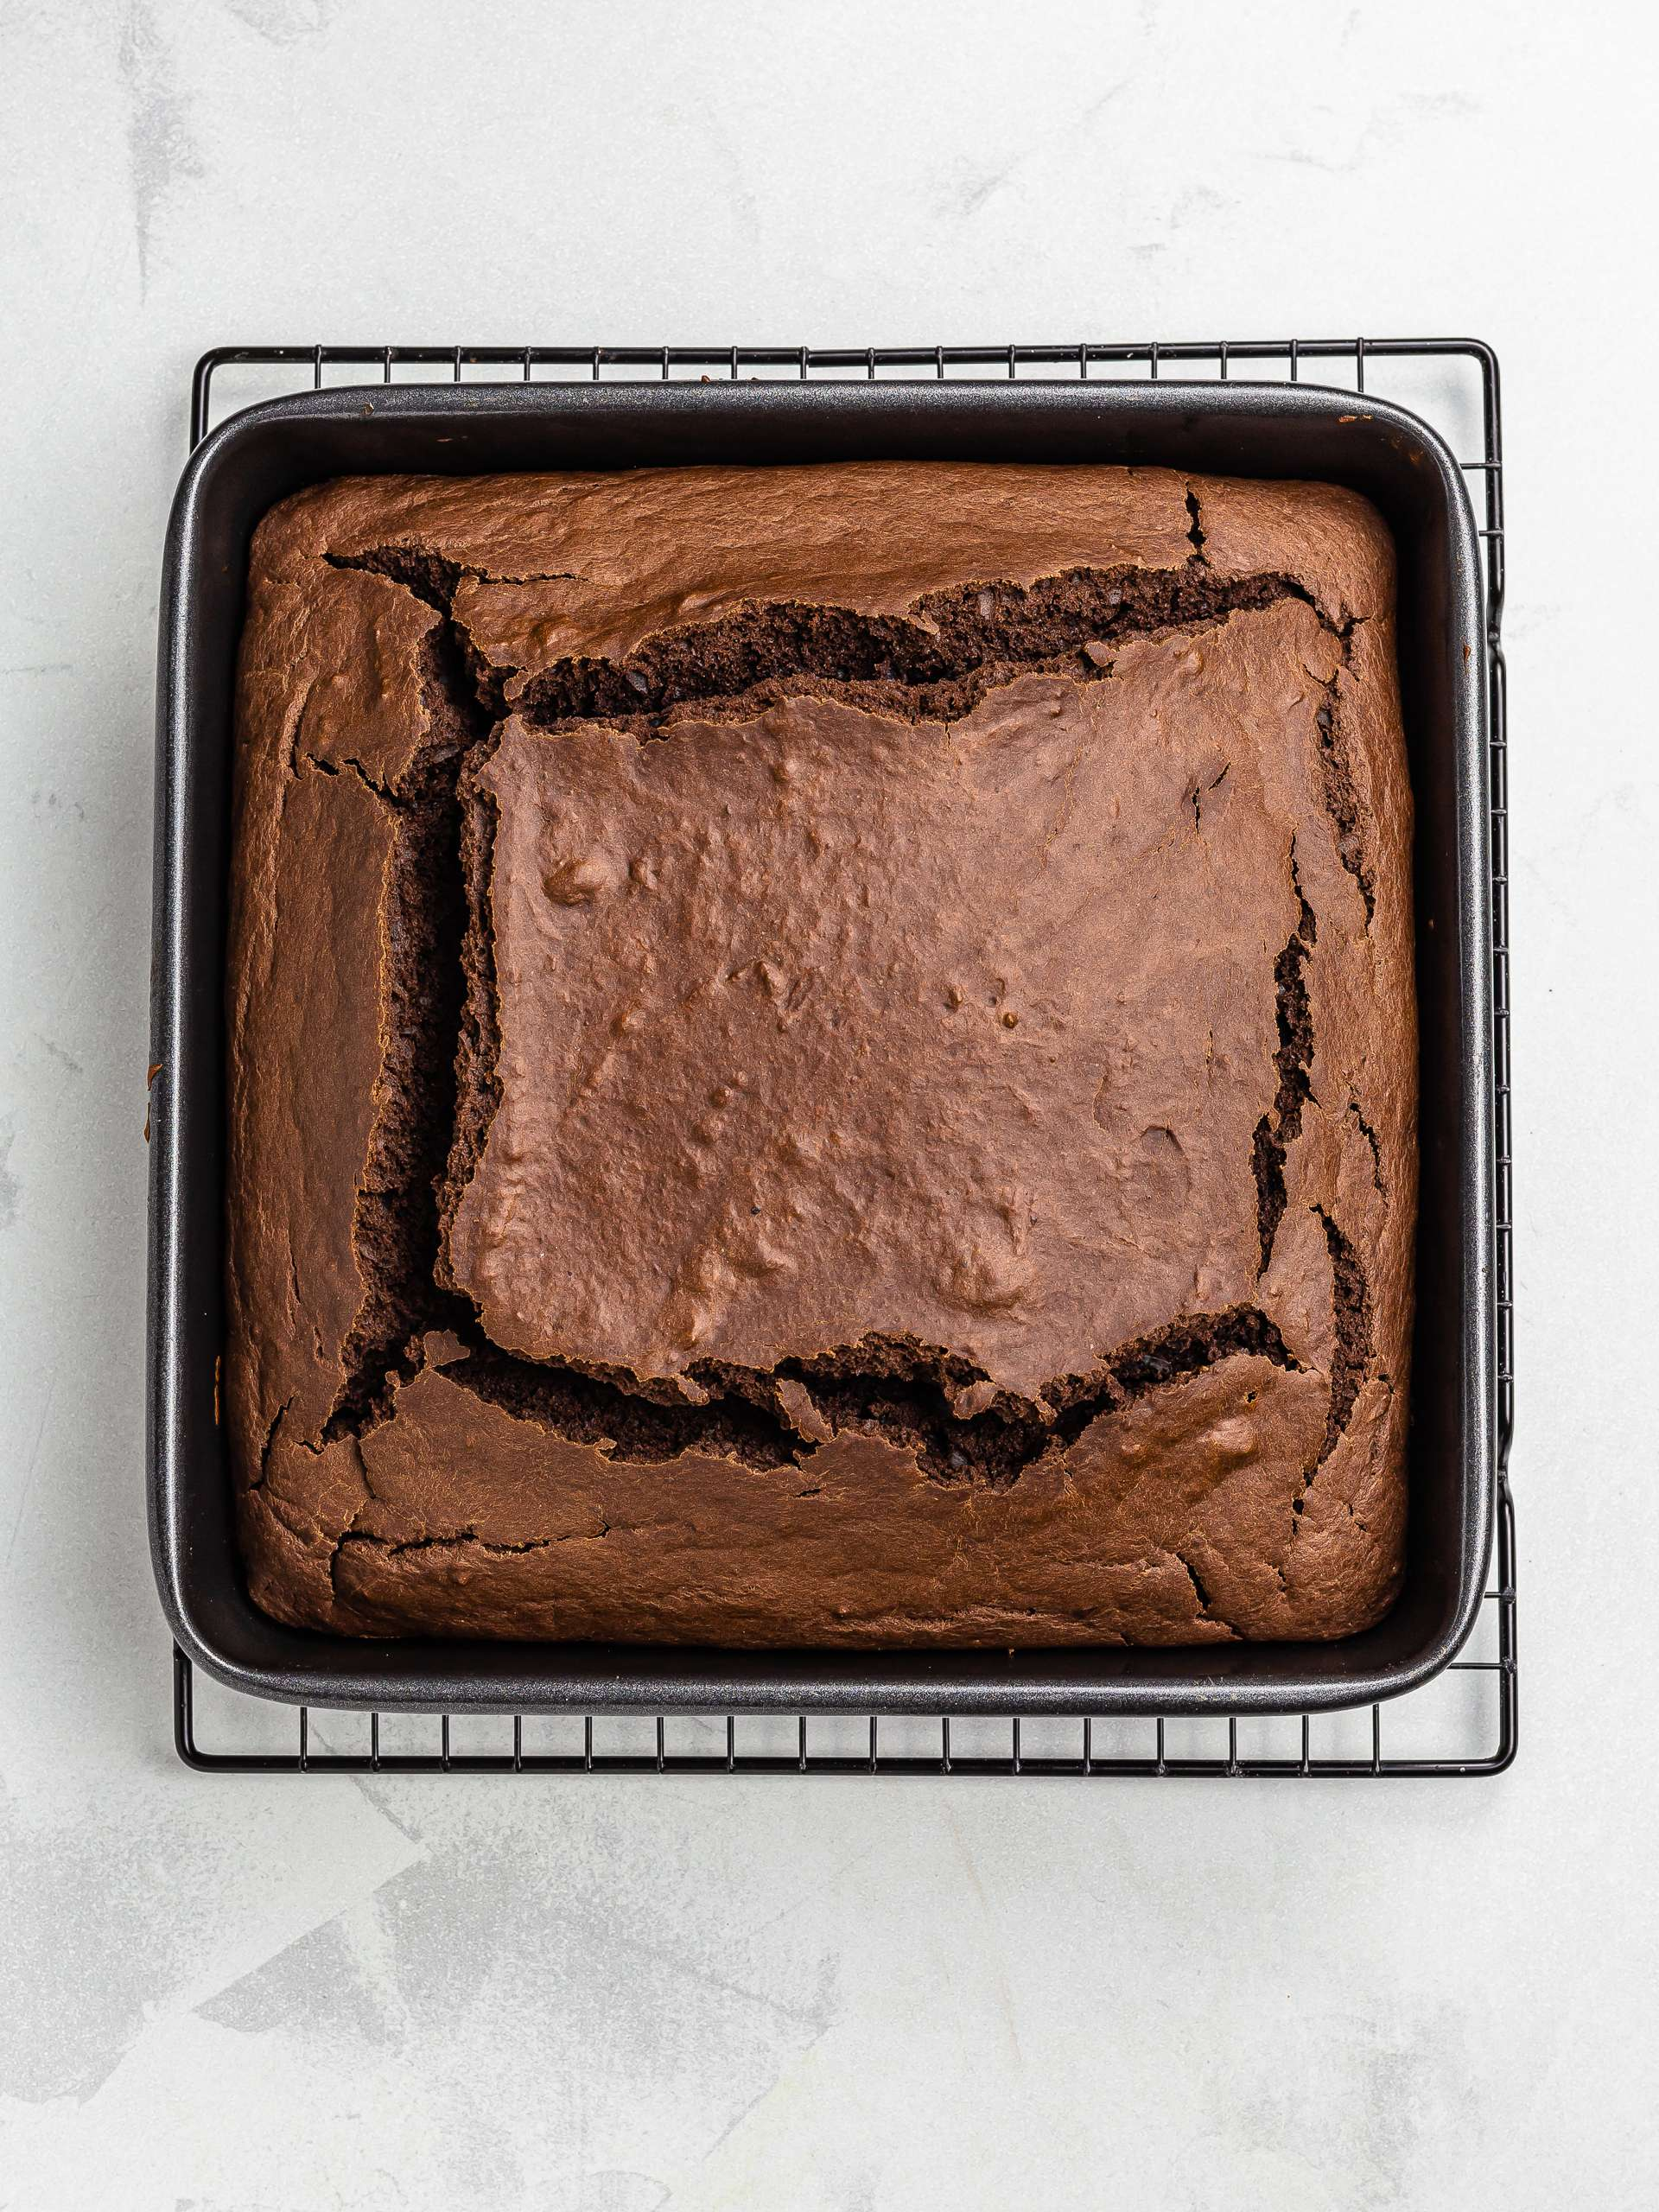 bake vegan chocolate cake